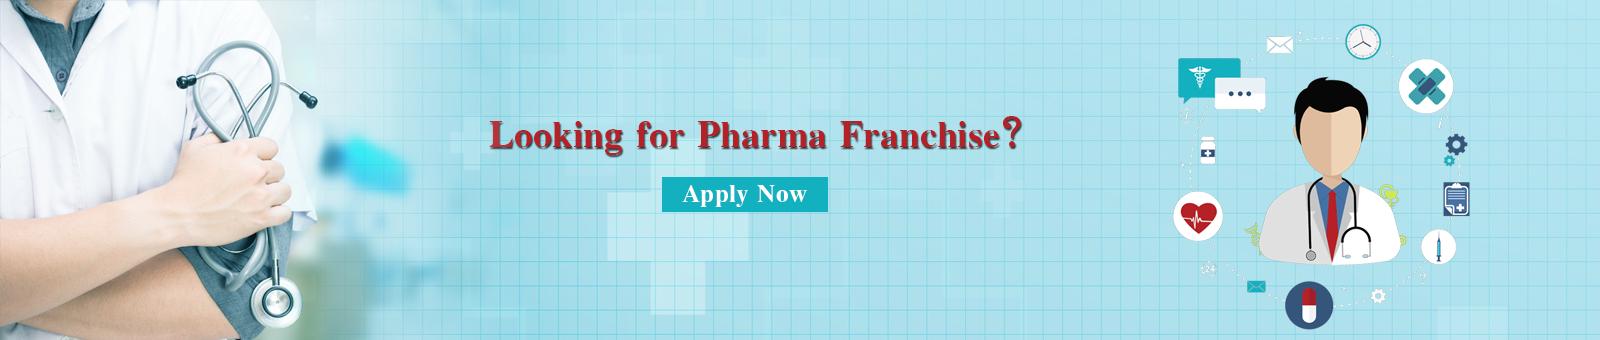 Best Pharma Franchise Company   Top 10 Pharma Franchise Company